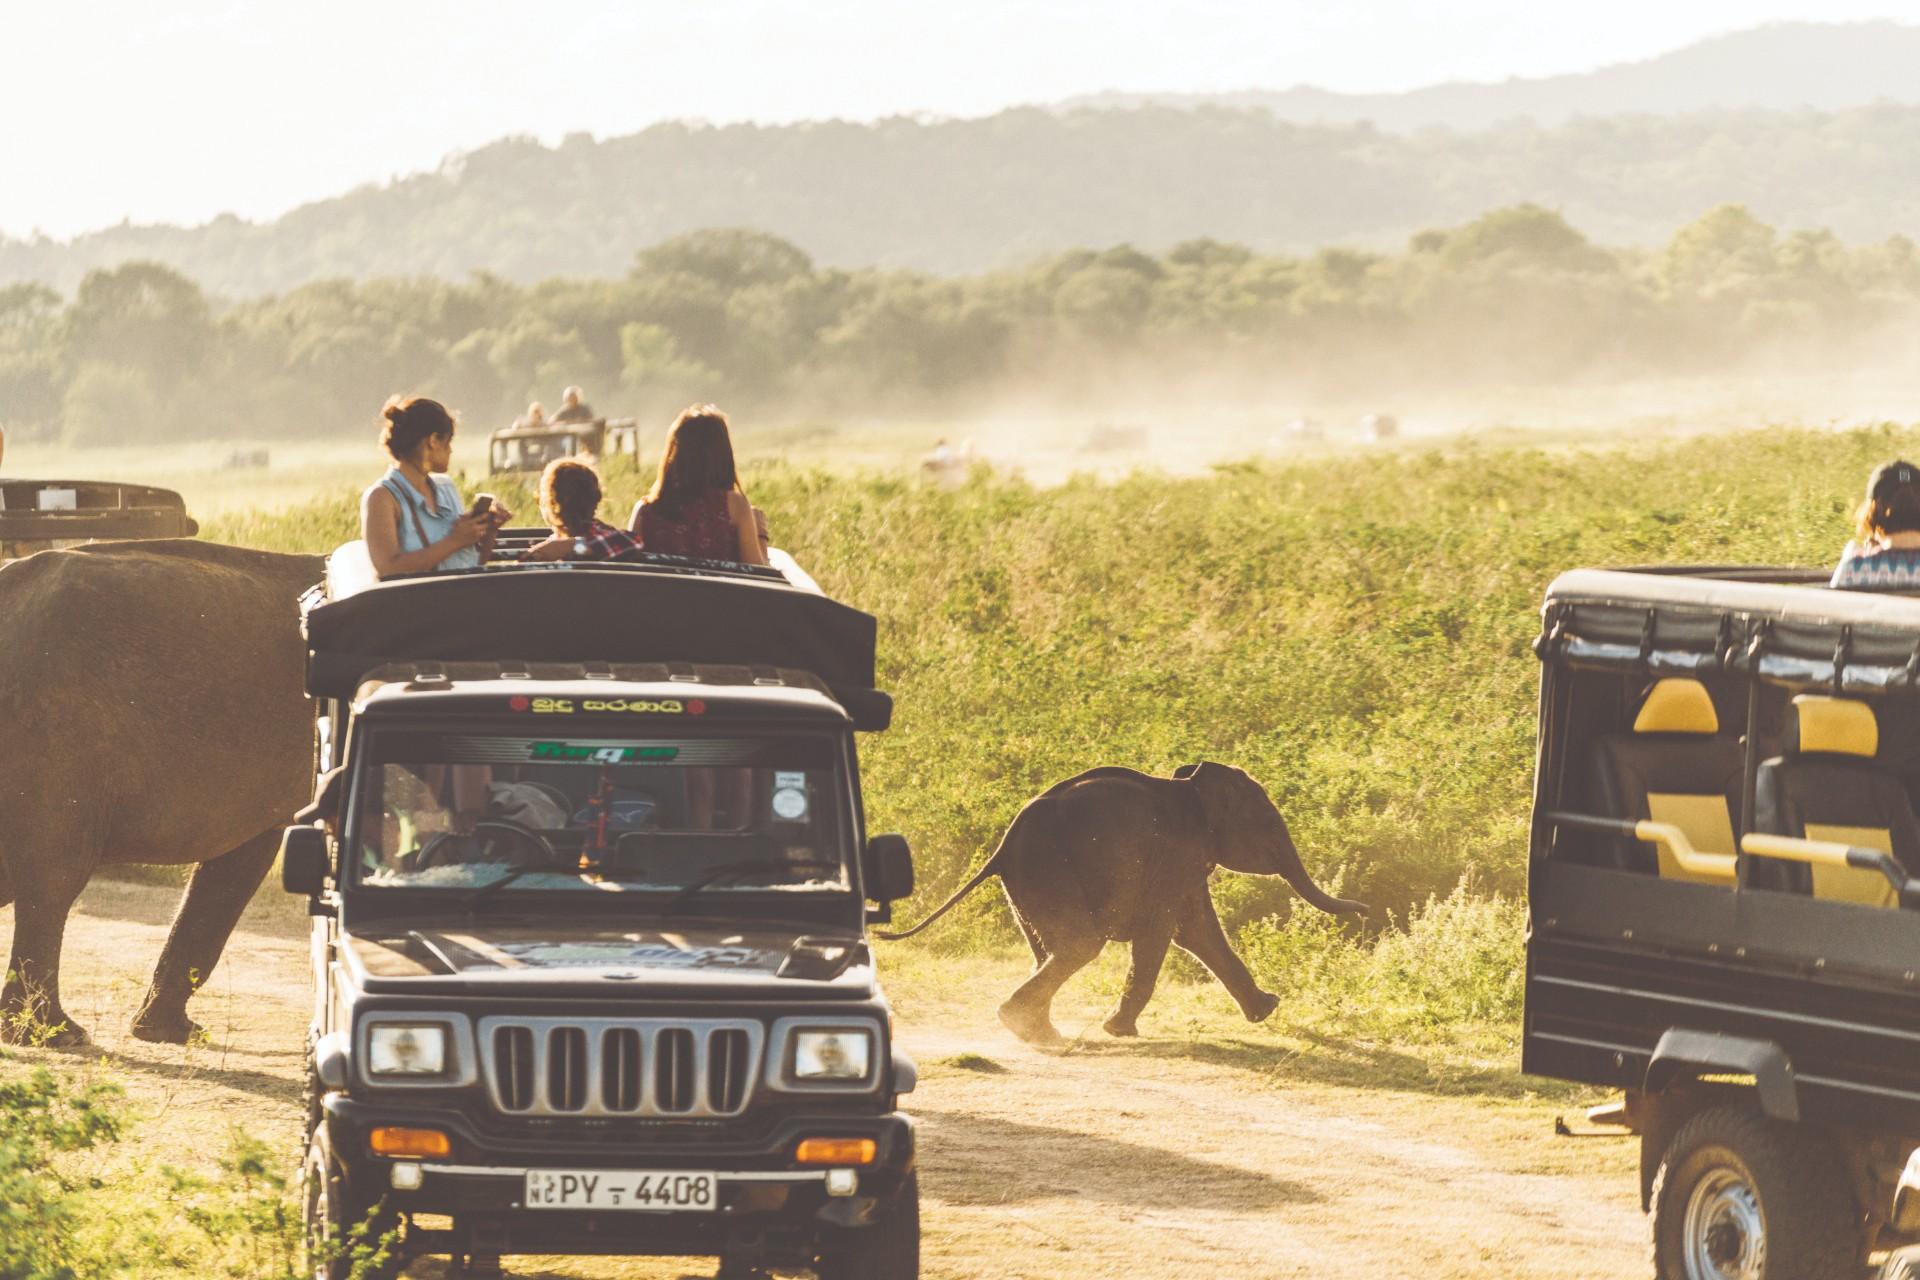 The Gold List 2020 Best International Destination — Sri Lanka